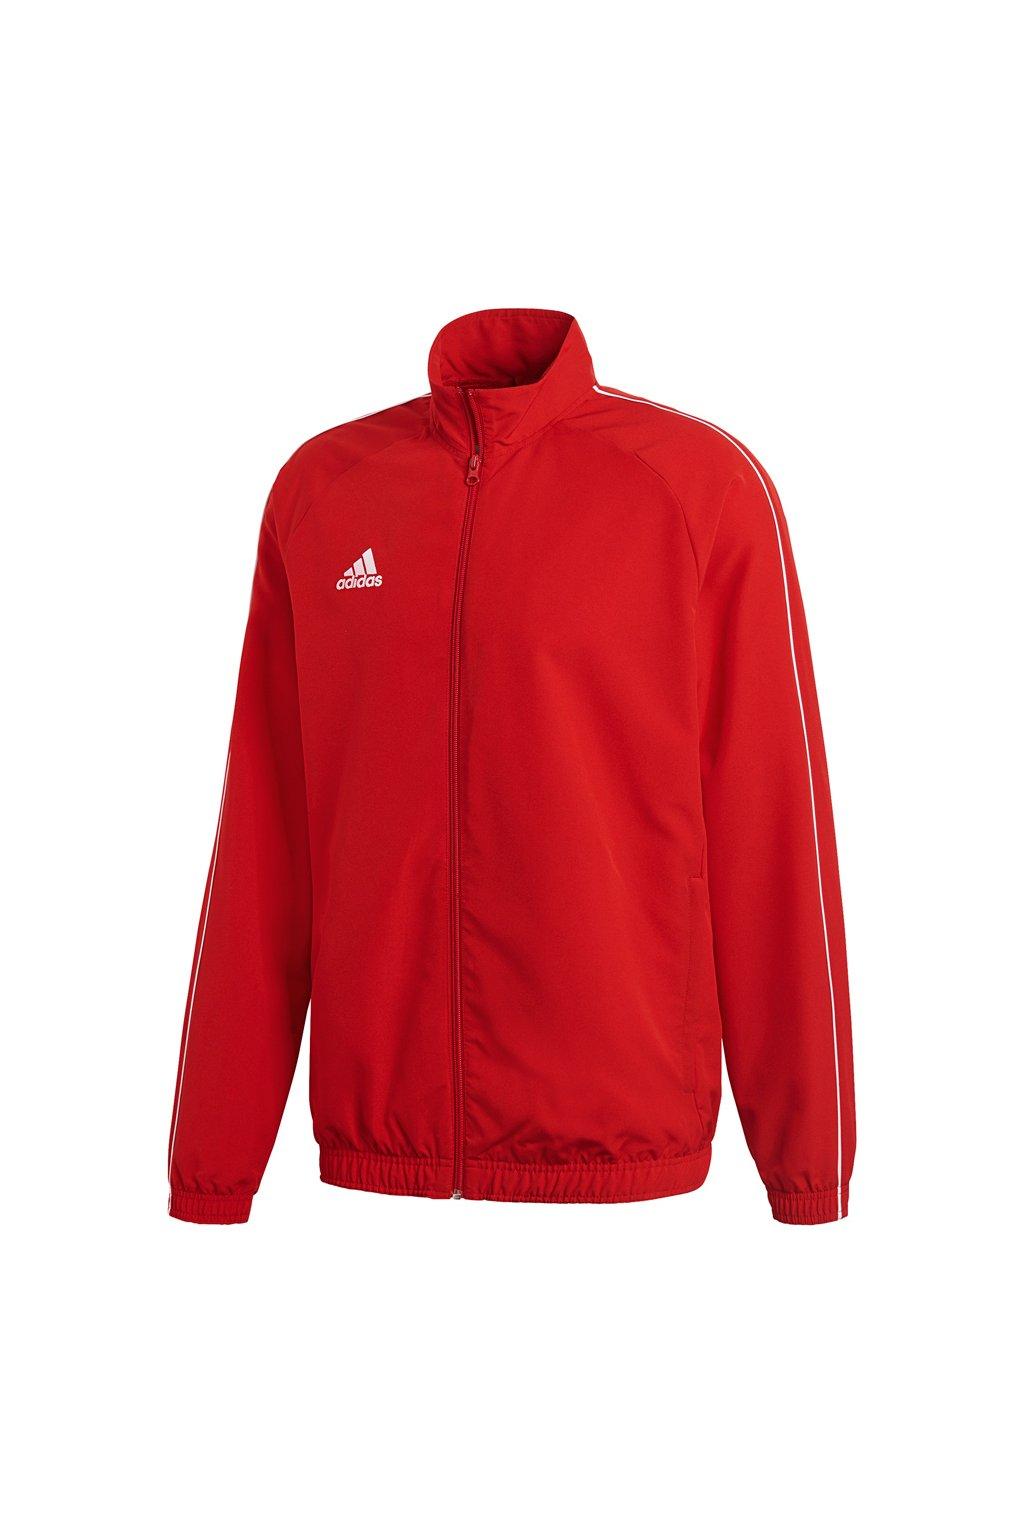 Pánska bunda Adidas Core 18 červená CV3686